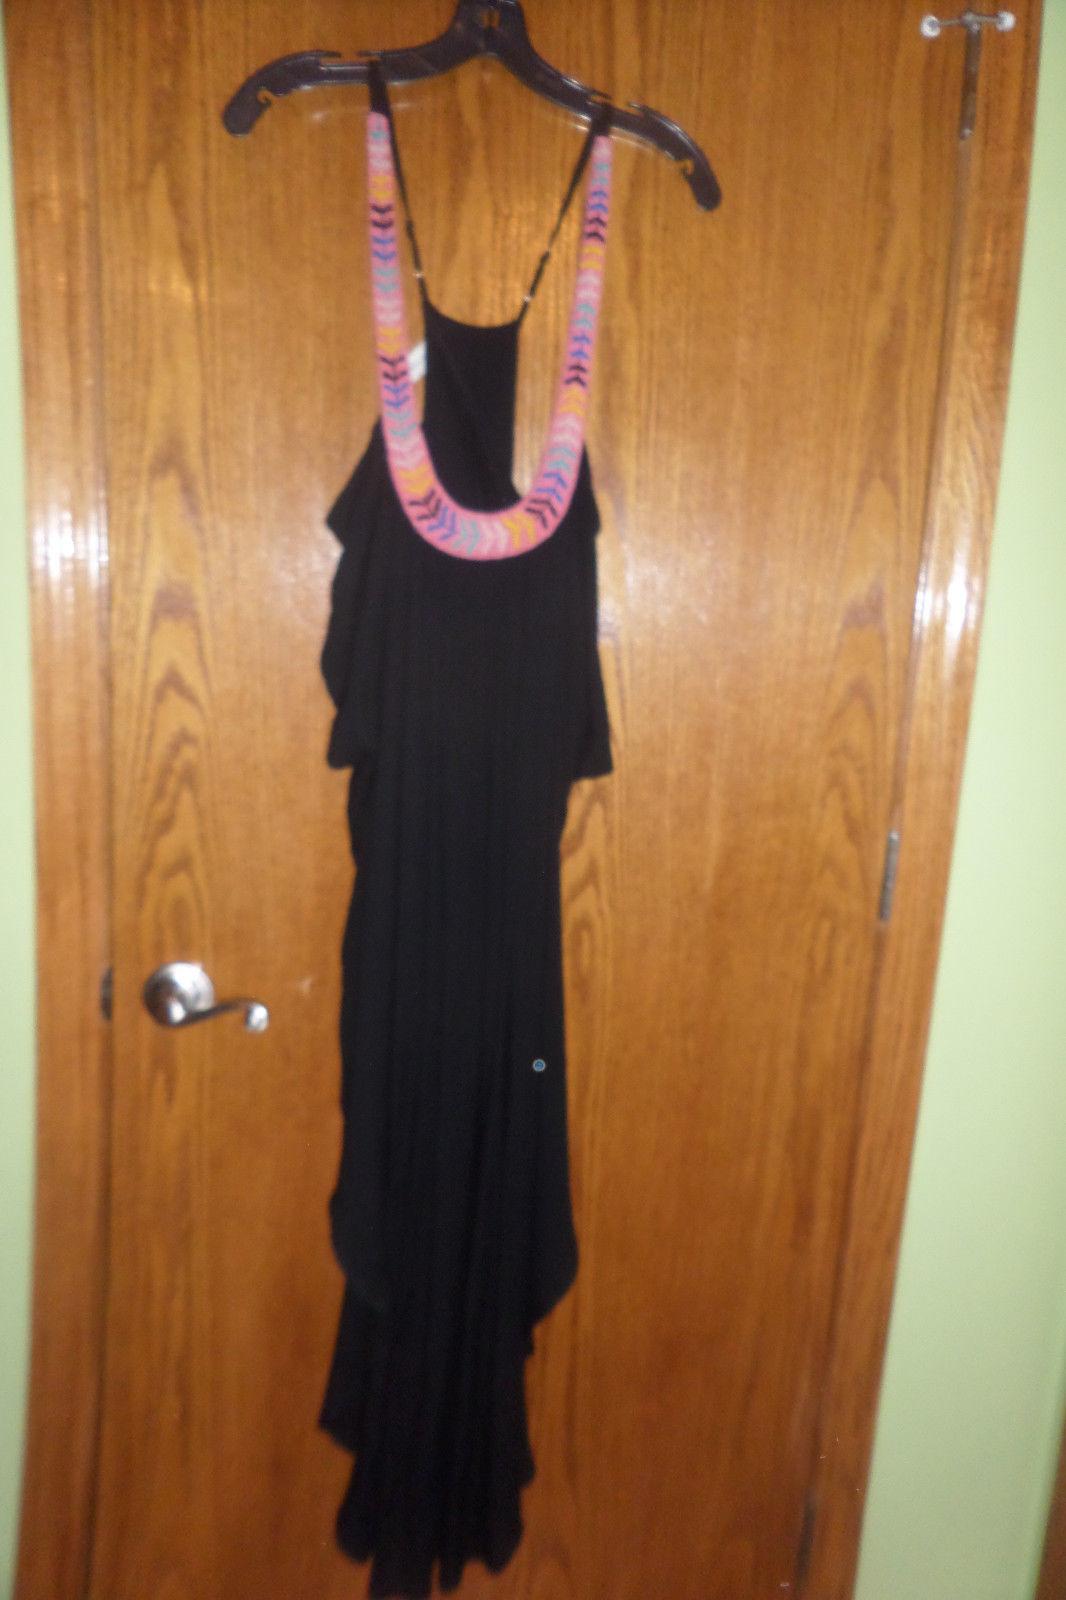 $348 MARA HOFFMAN ANTHROPOLOGIE BEADED BLACK LONG CAFTAN DRESS SIZE XS/S image 4